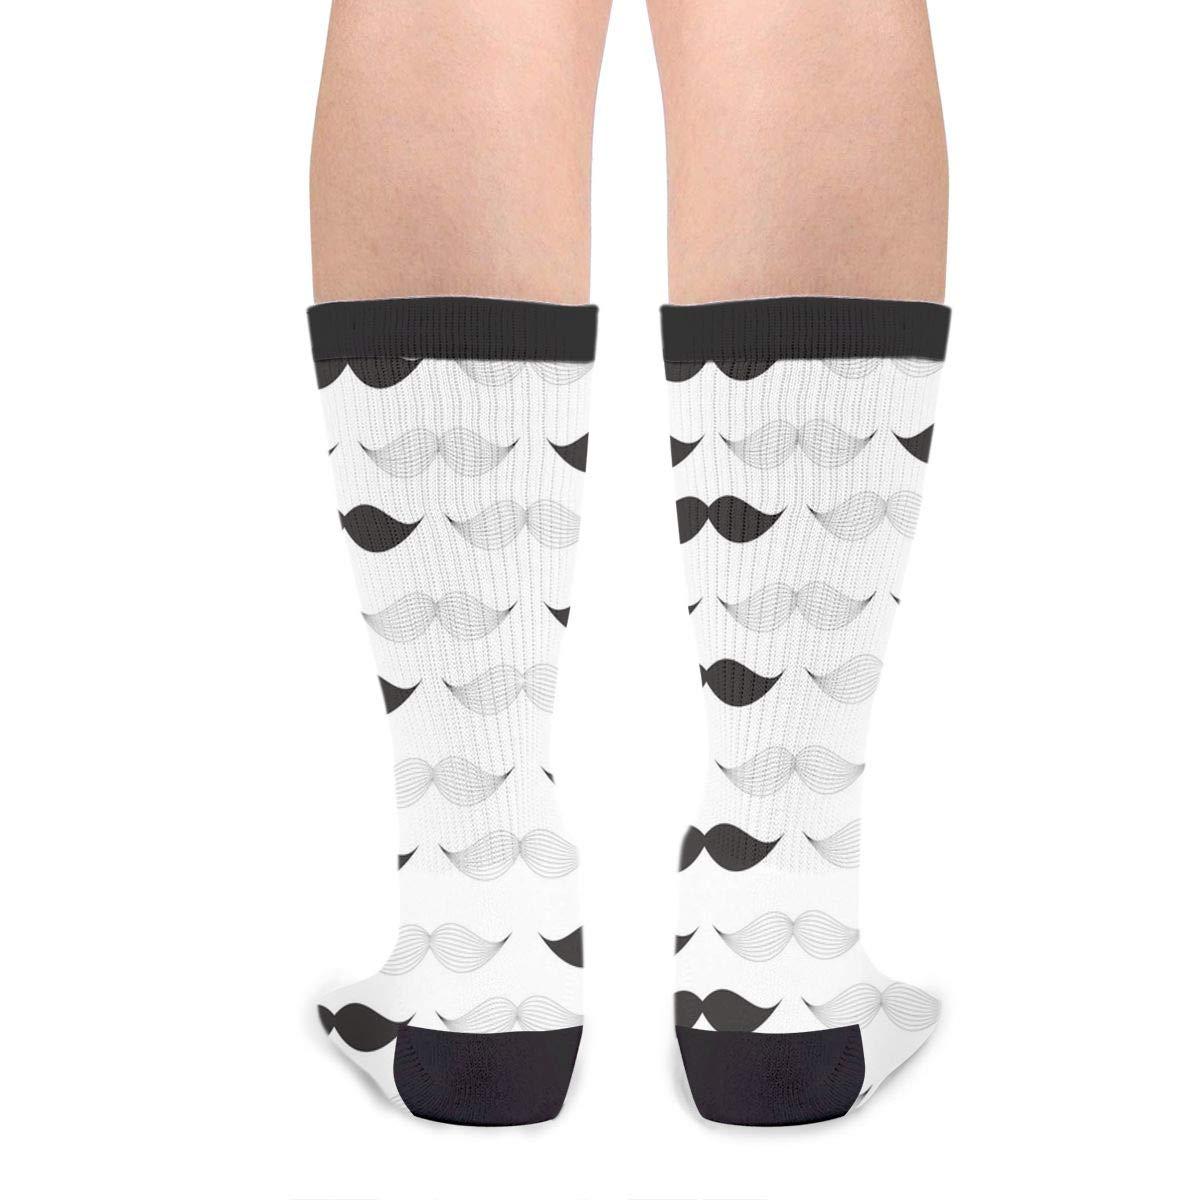 Fashion Travel Breathable Socks Moustache Black White Happy Fathers Day Men /& Women Running Casual Socks